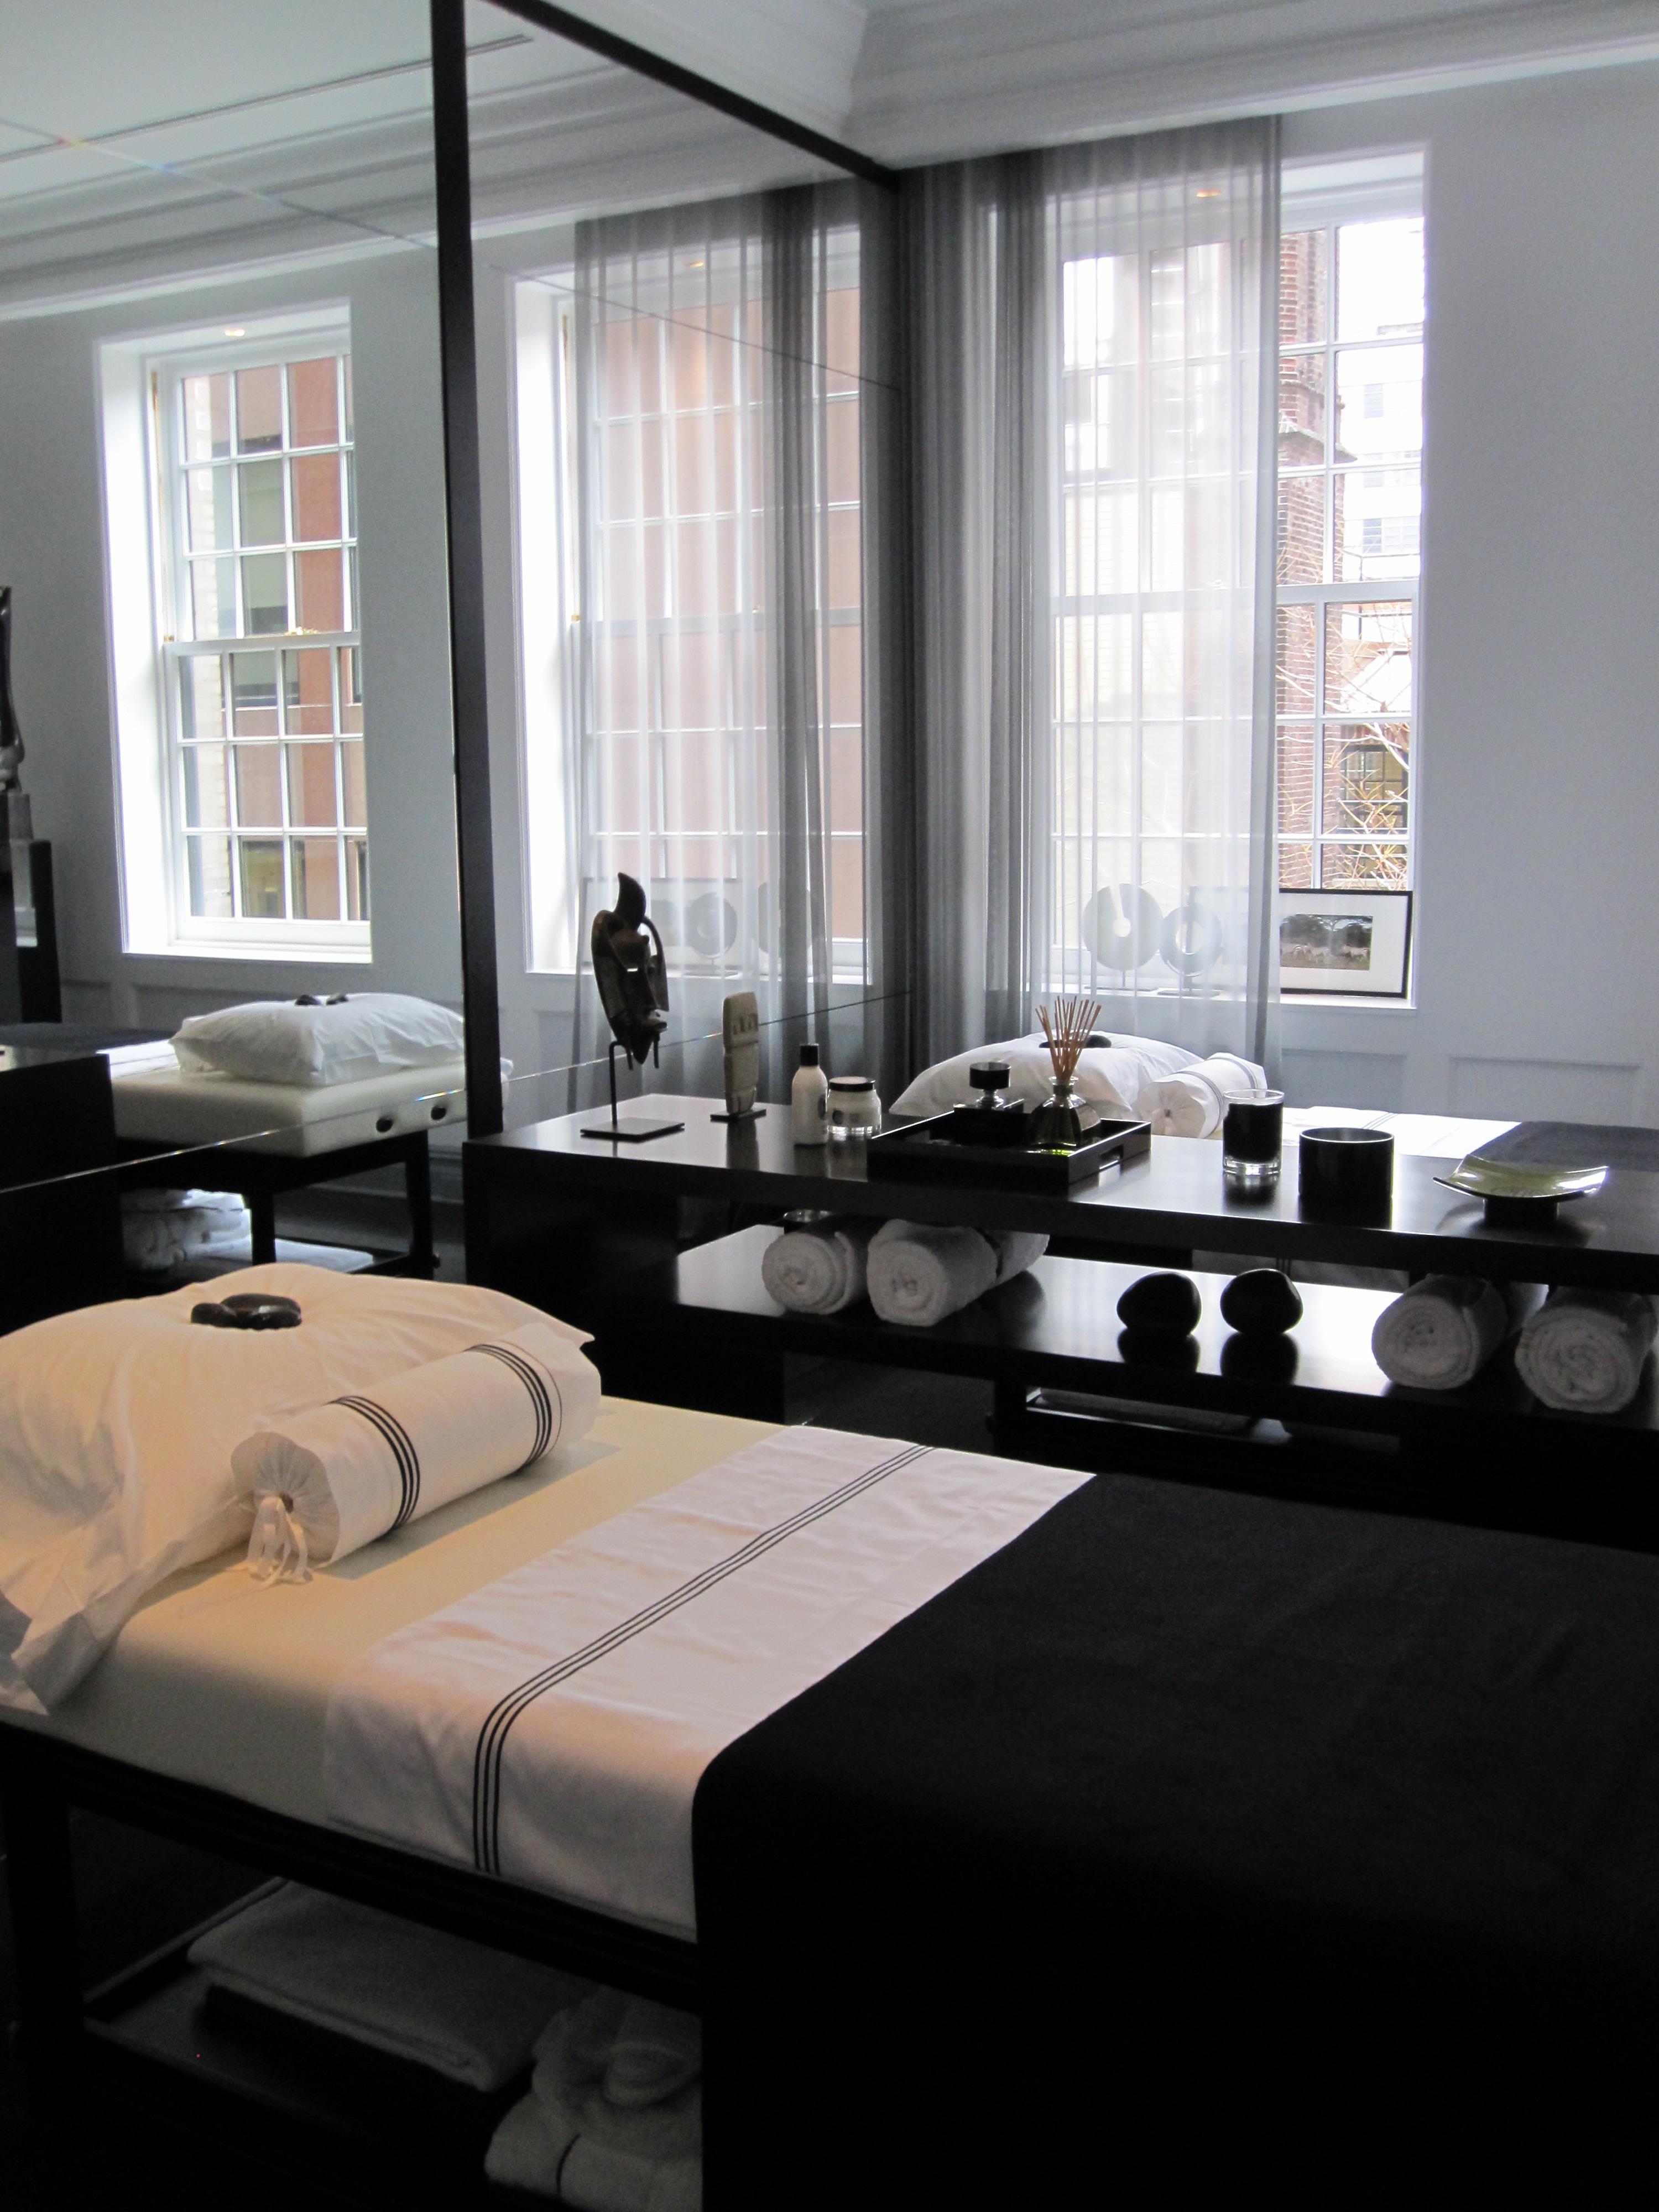 1000 images about Massage Business ideas on Pinterest